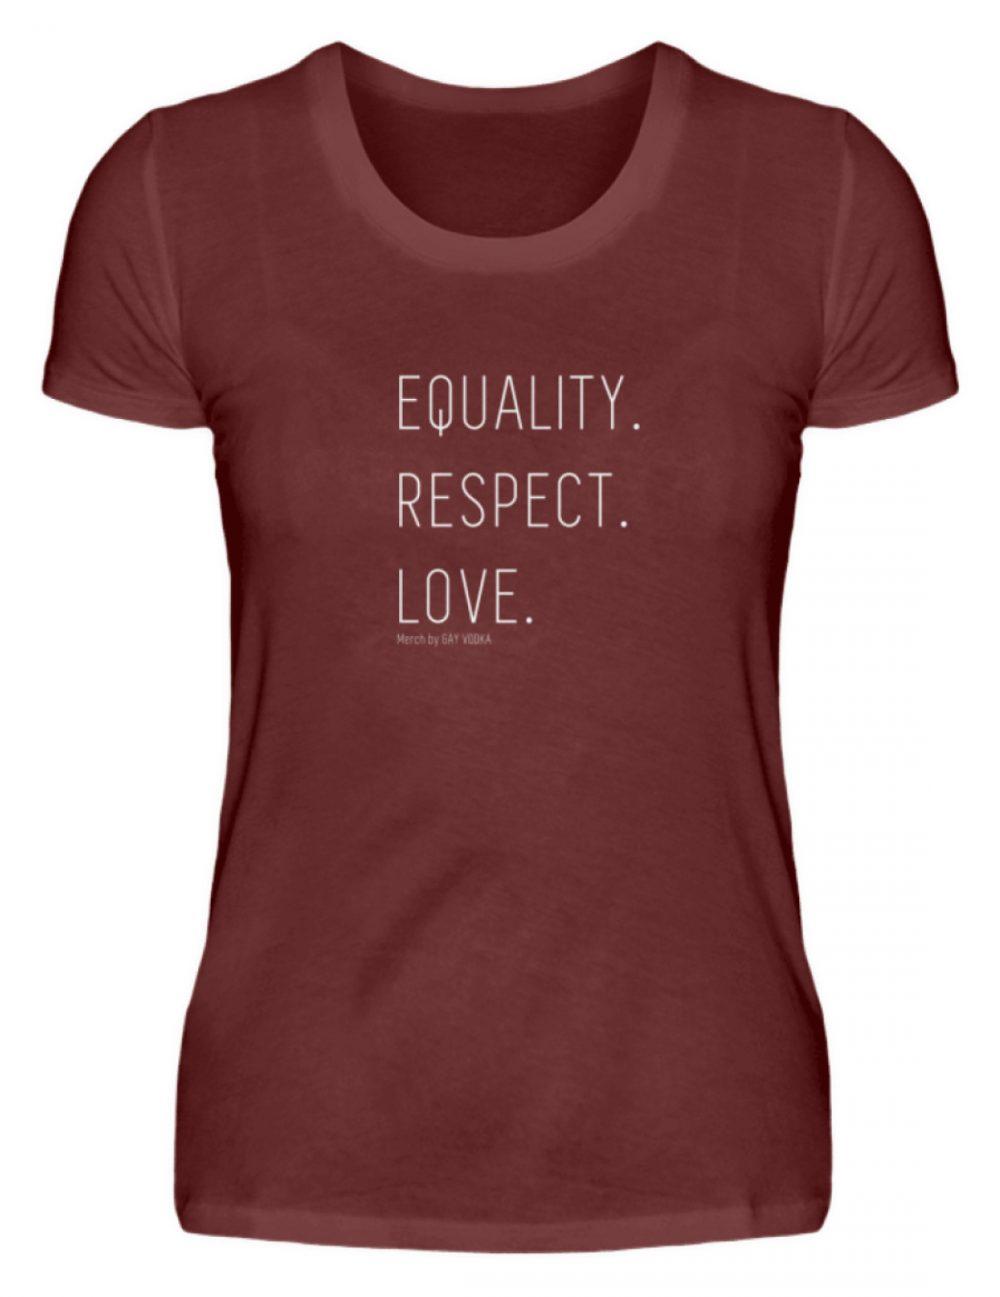 EQUALITY. RESPECT. LOVE. - Damen Premiumshirt-3192